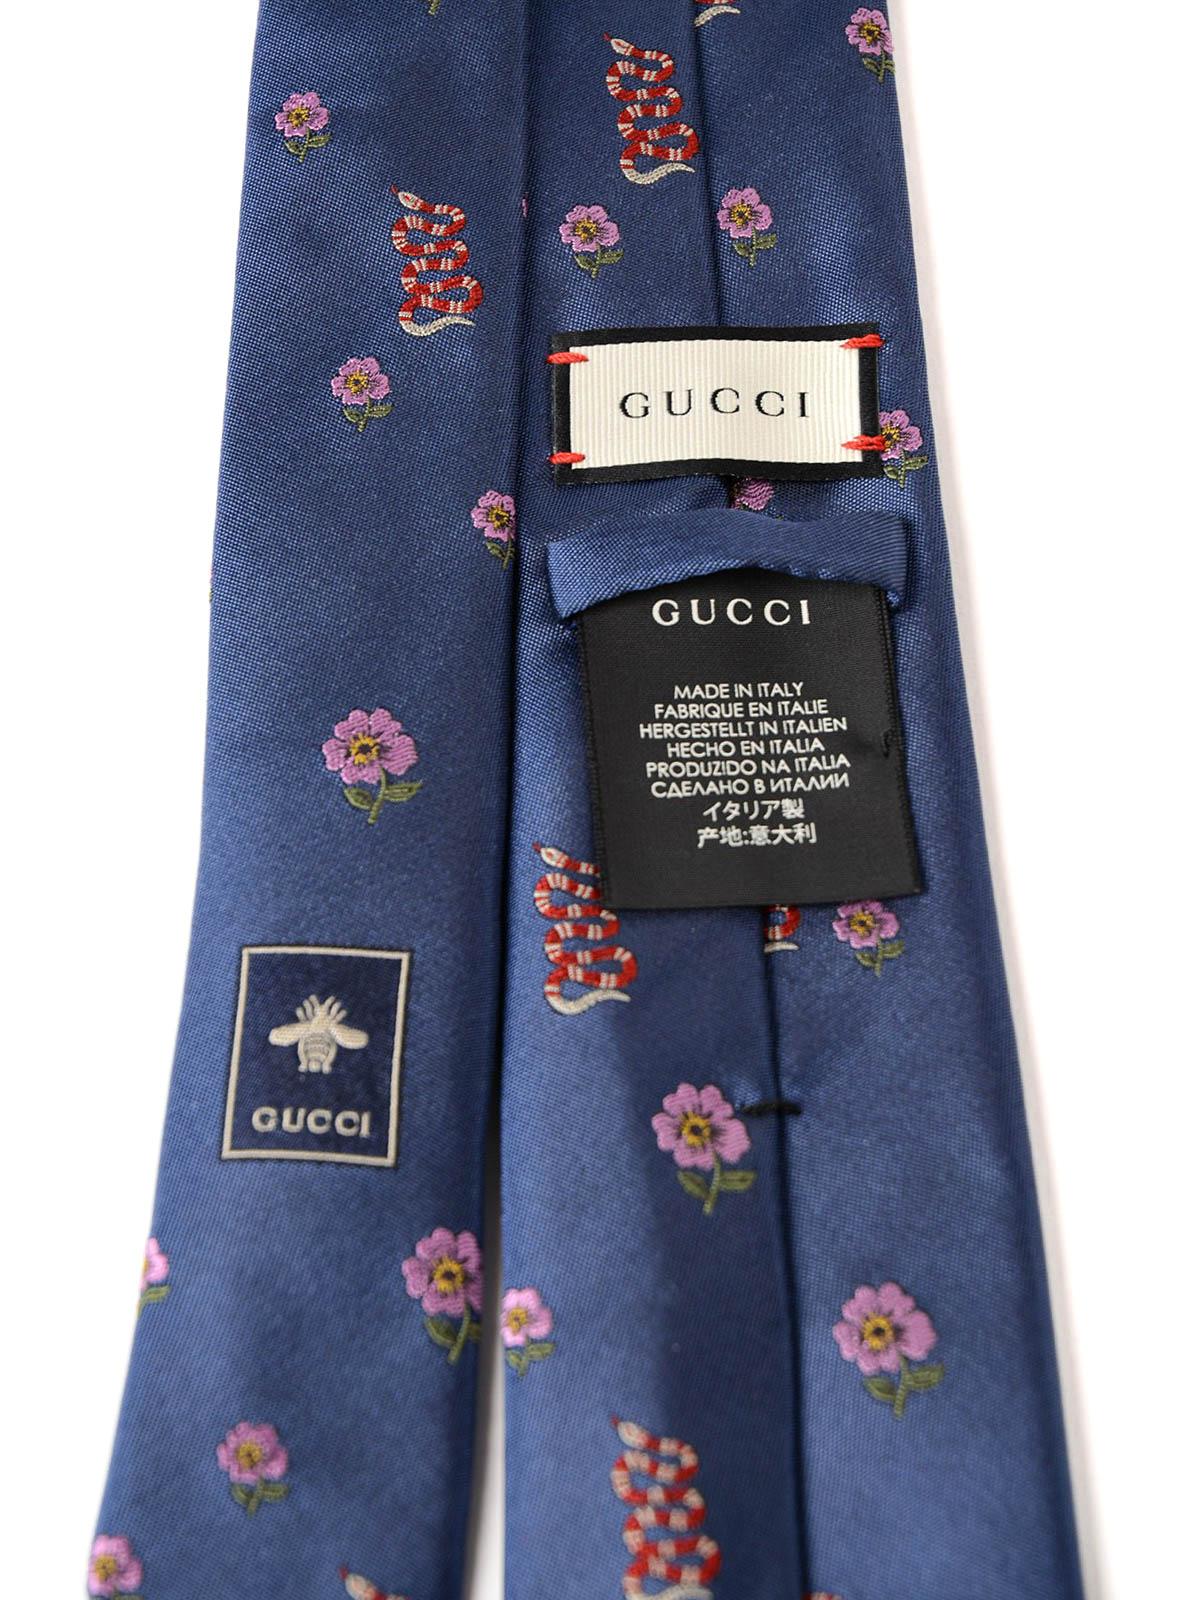 Gucci Ties Bow Ties Online Flower And Snake Pattern Silk Tie